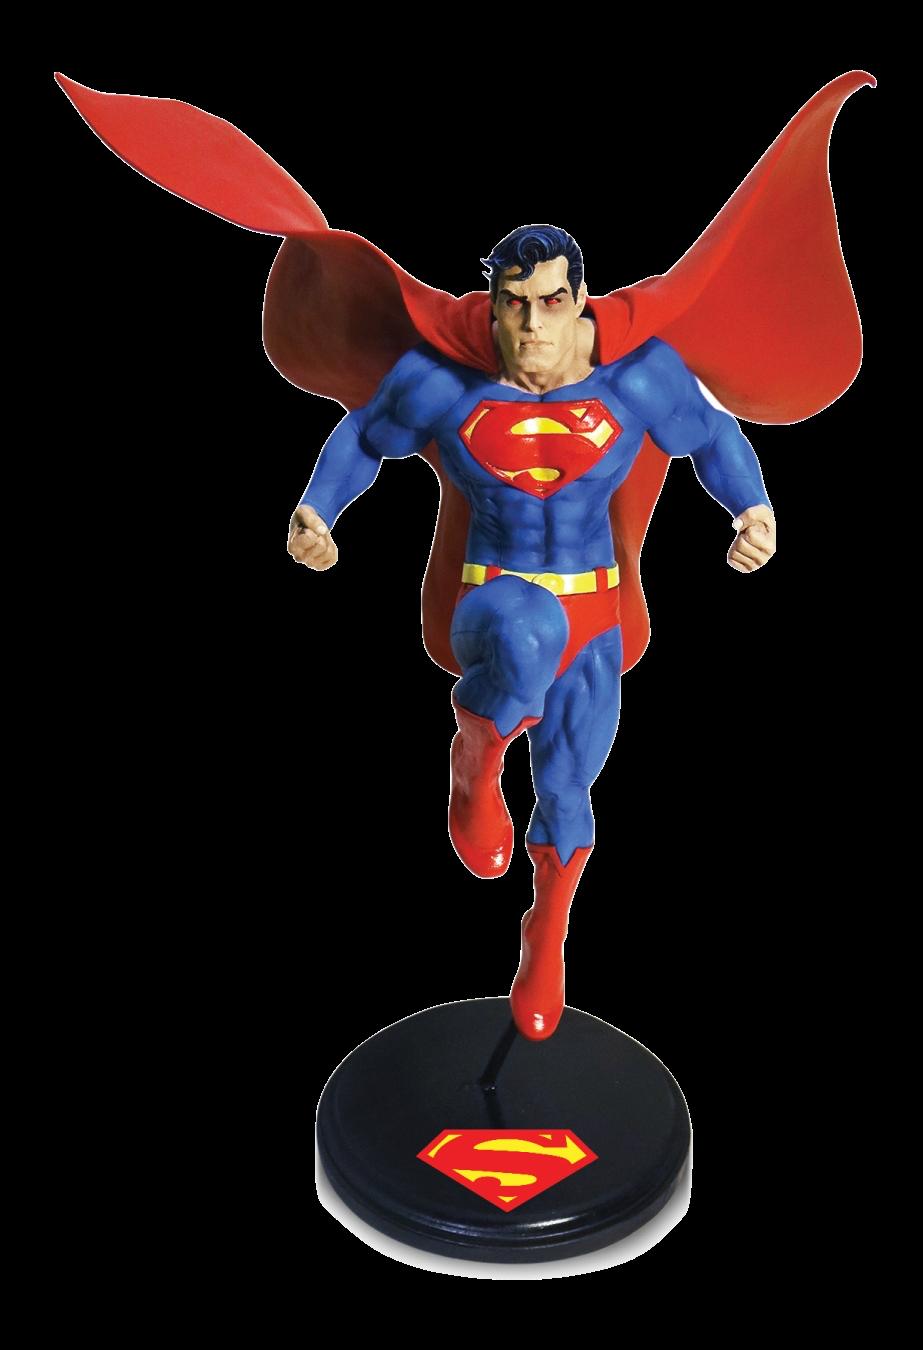 dc-designer-series-superman-jim-lee-statue-toyslife